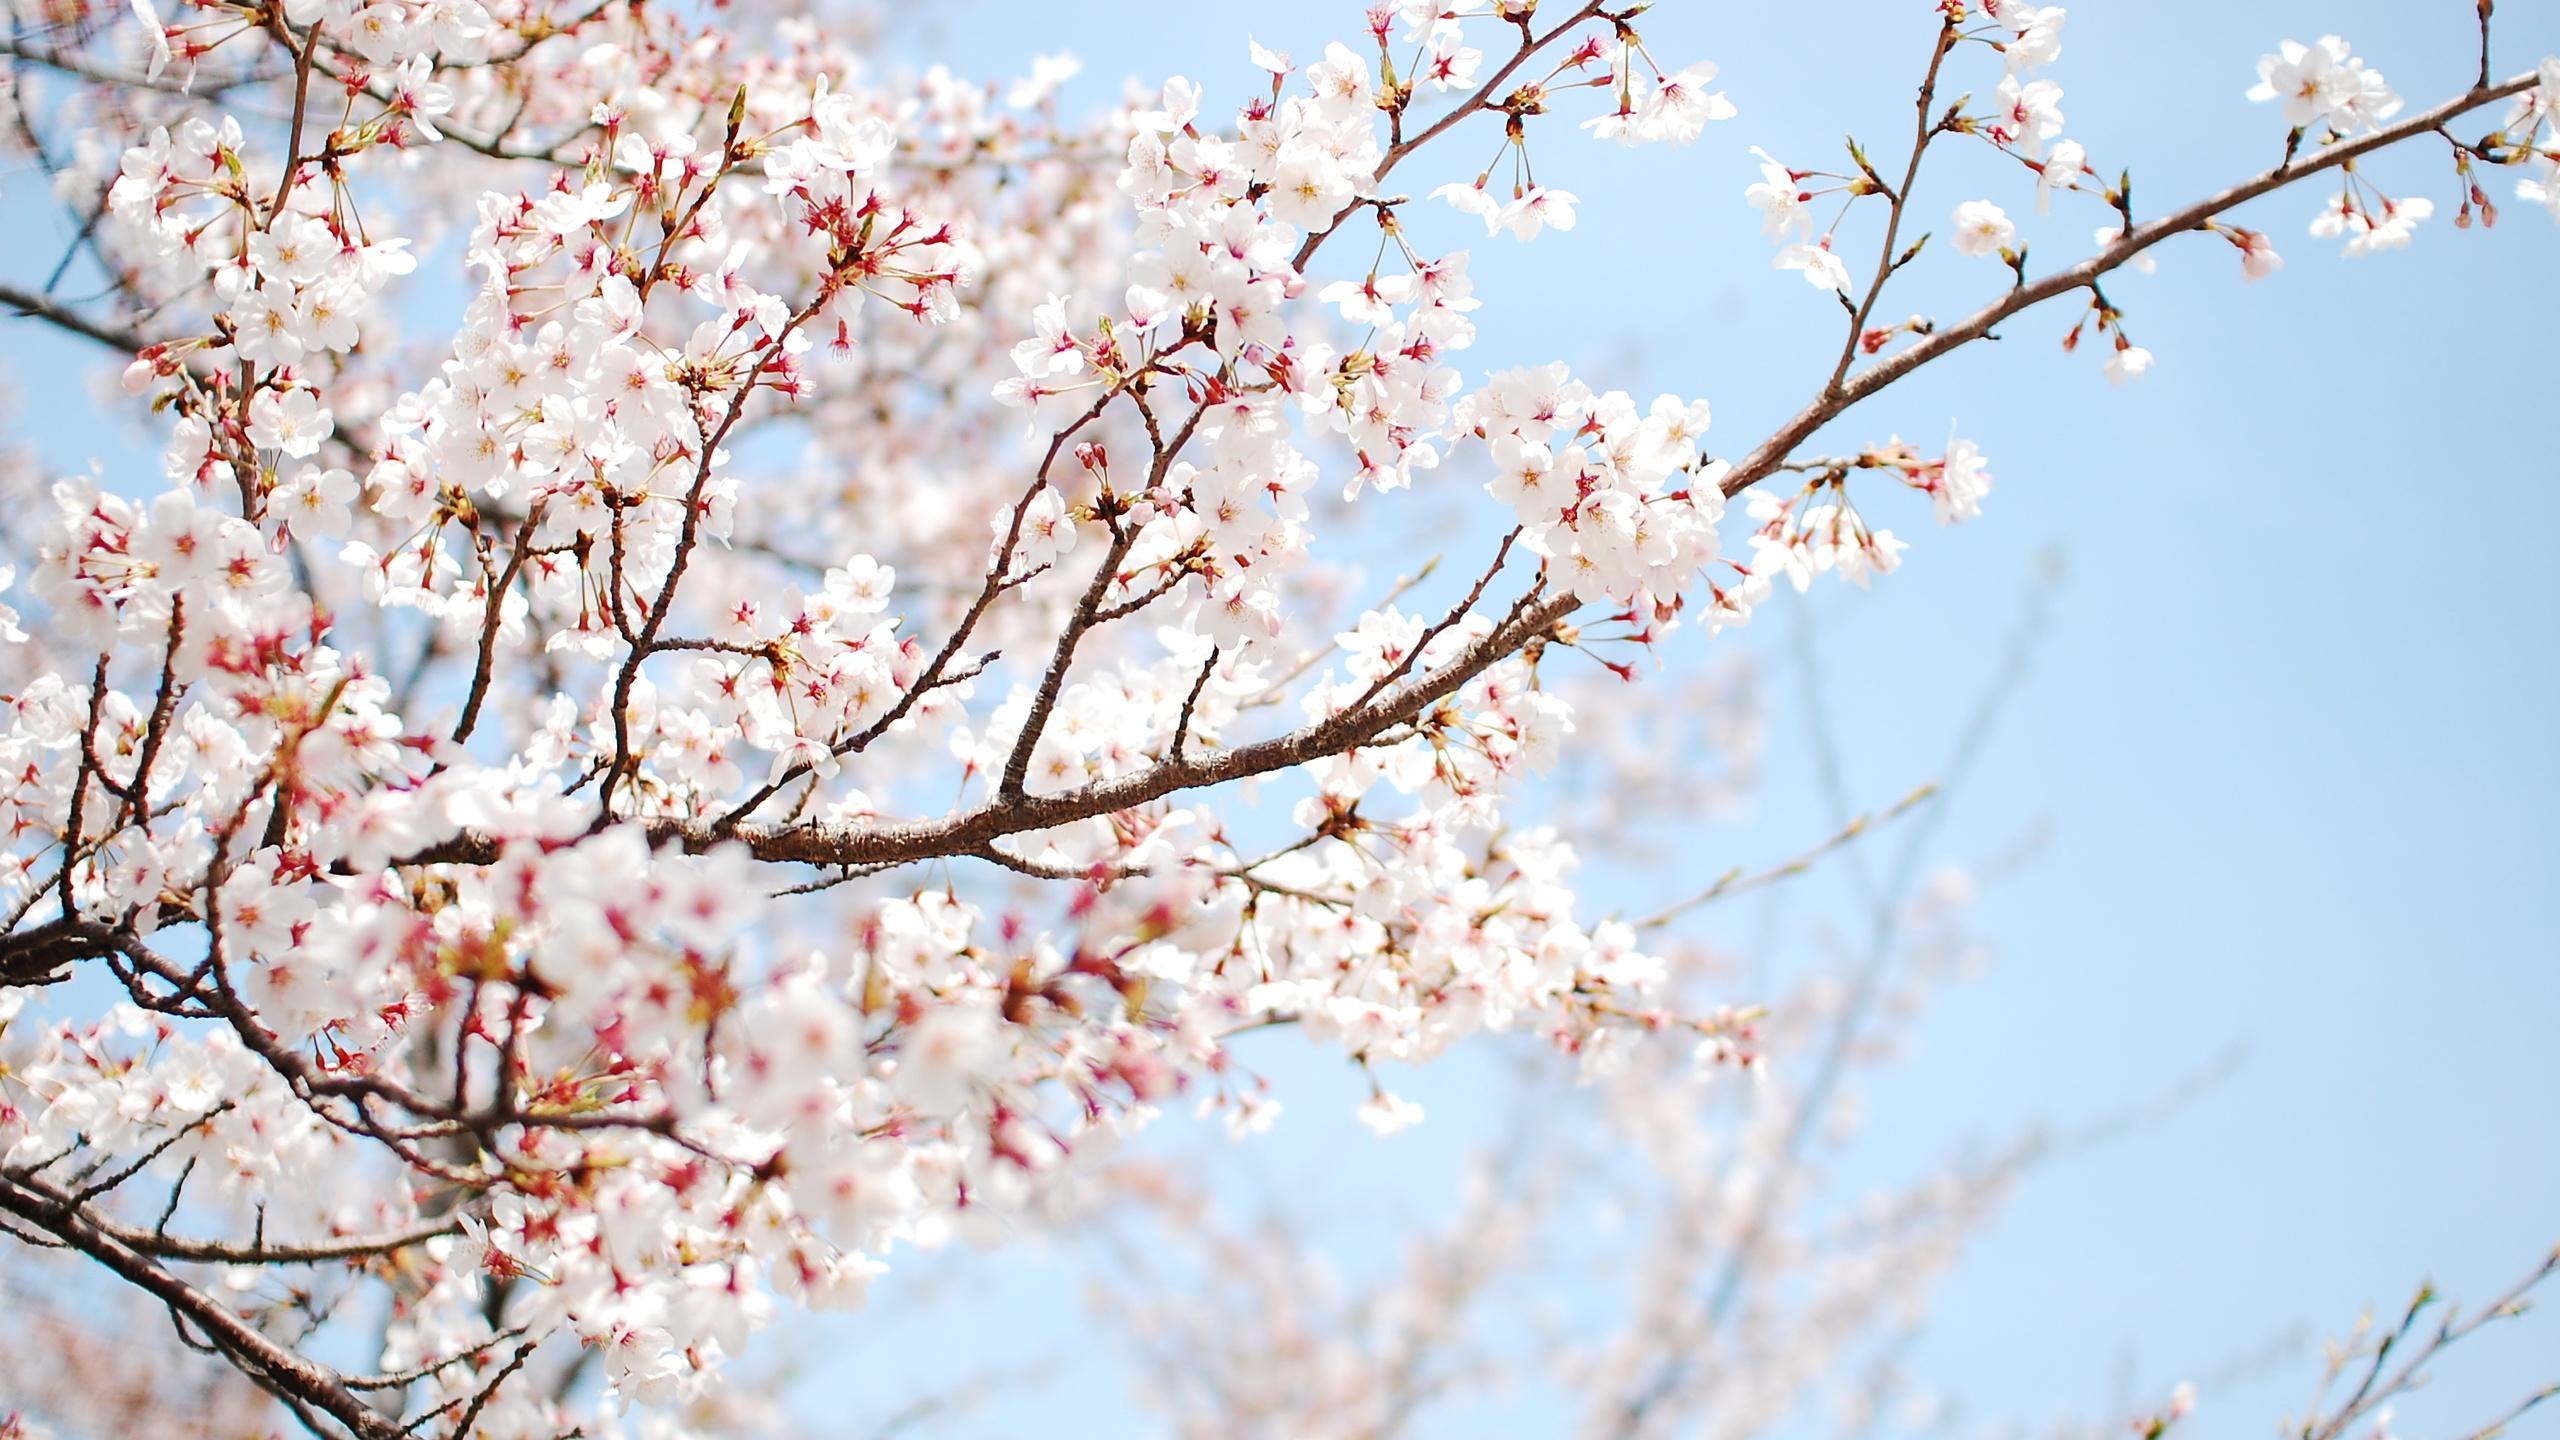 cherry blossom wallpaper 2560x1440